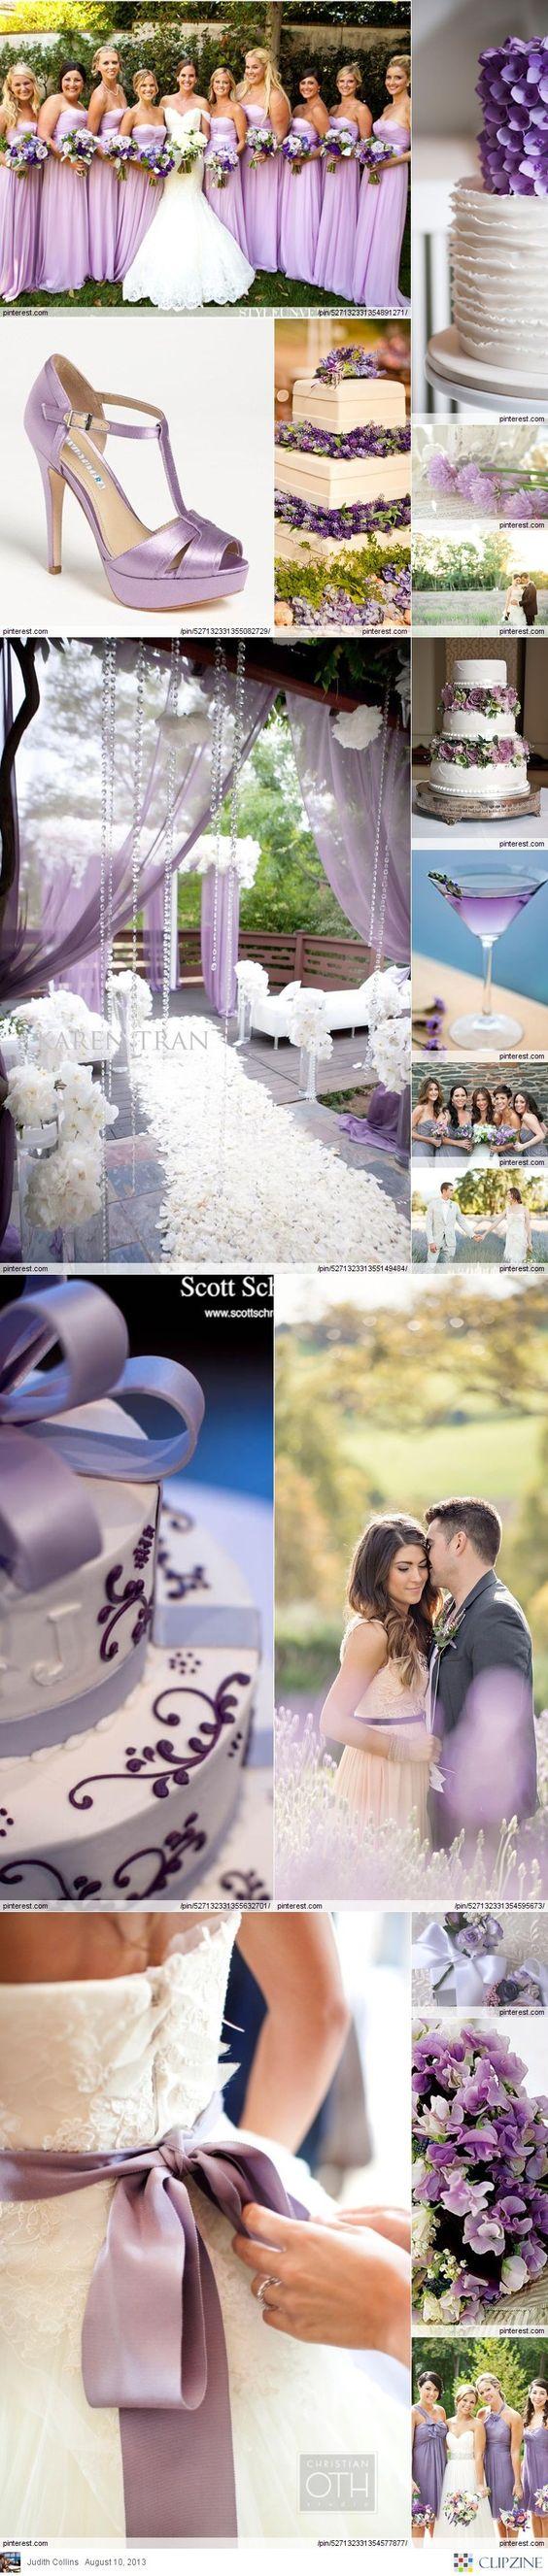 Lavender Weddings- perfect color scheme.  #weddings #weddingwednesday #wedding.